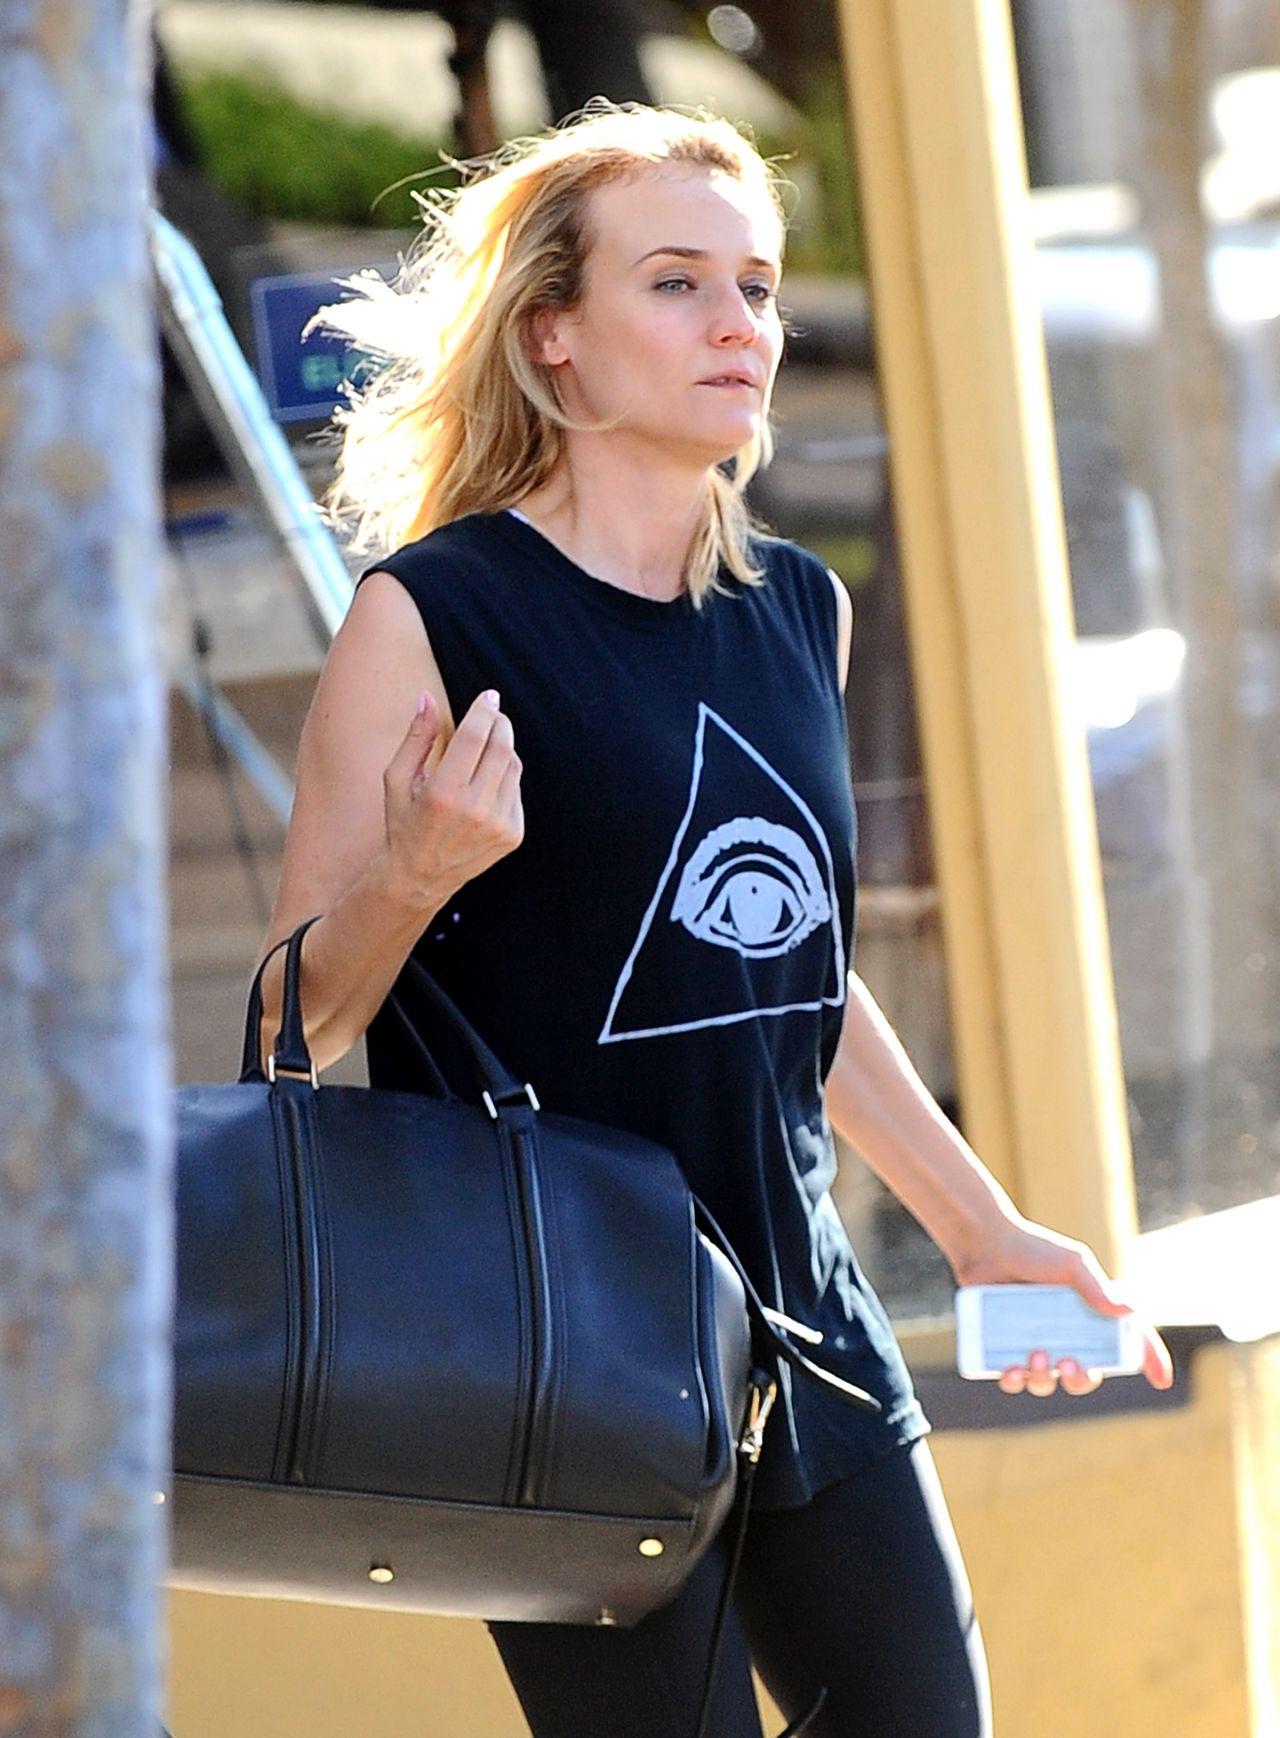 Diane Kruger in Tights - Leaving a Gym in Los Angeles - September 2014